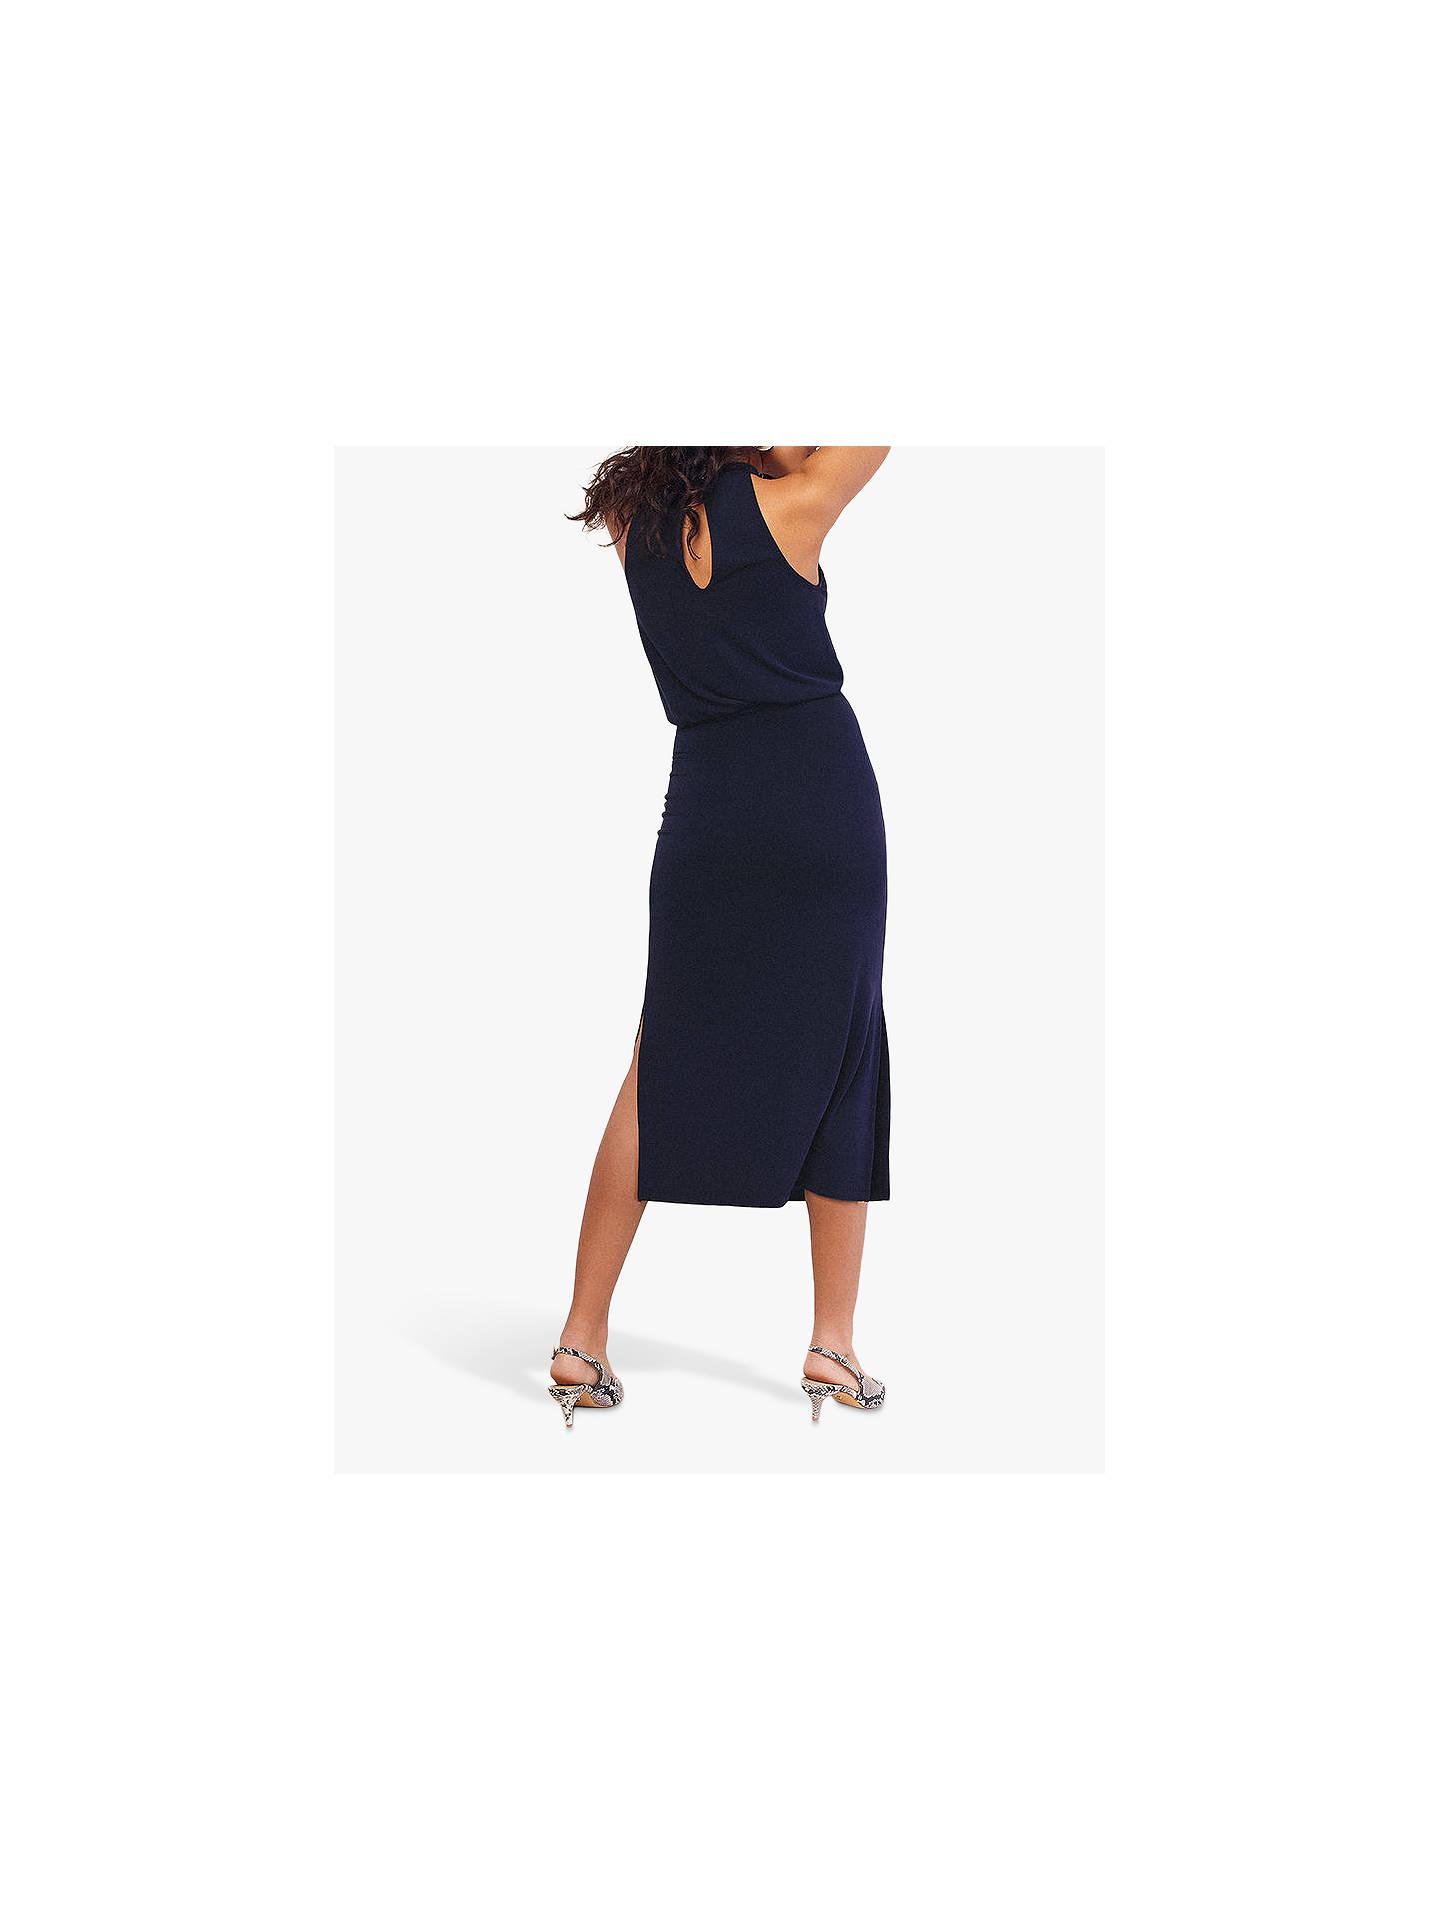 c2deec2f5f82 ... Buy Oasis Halter Cupro Midi Dress, Navy, L Online at johnlewis.com ...